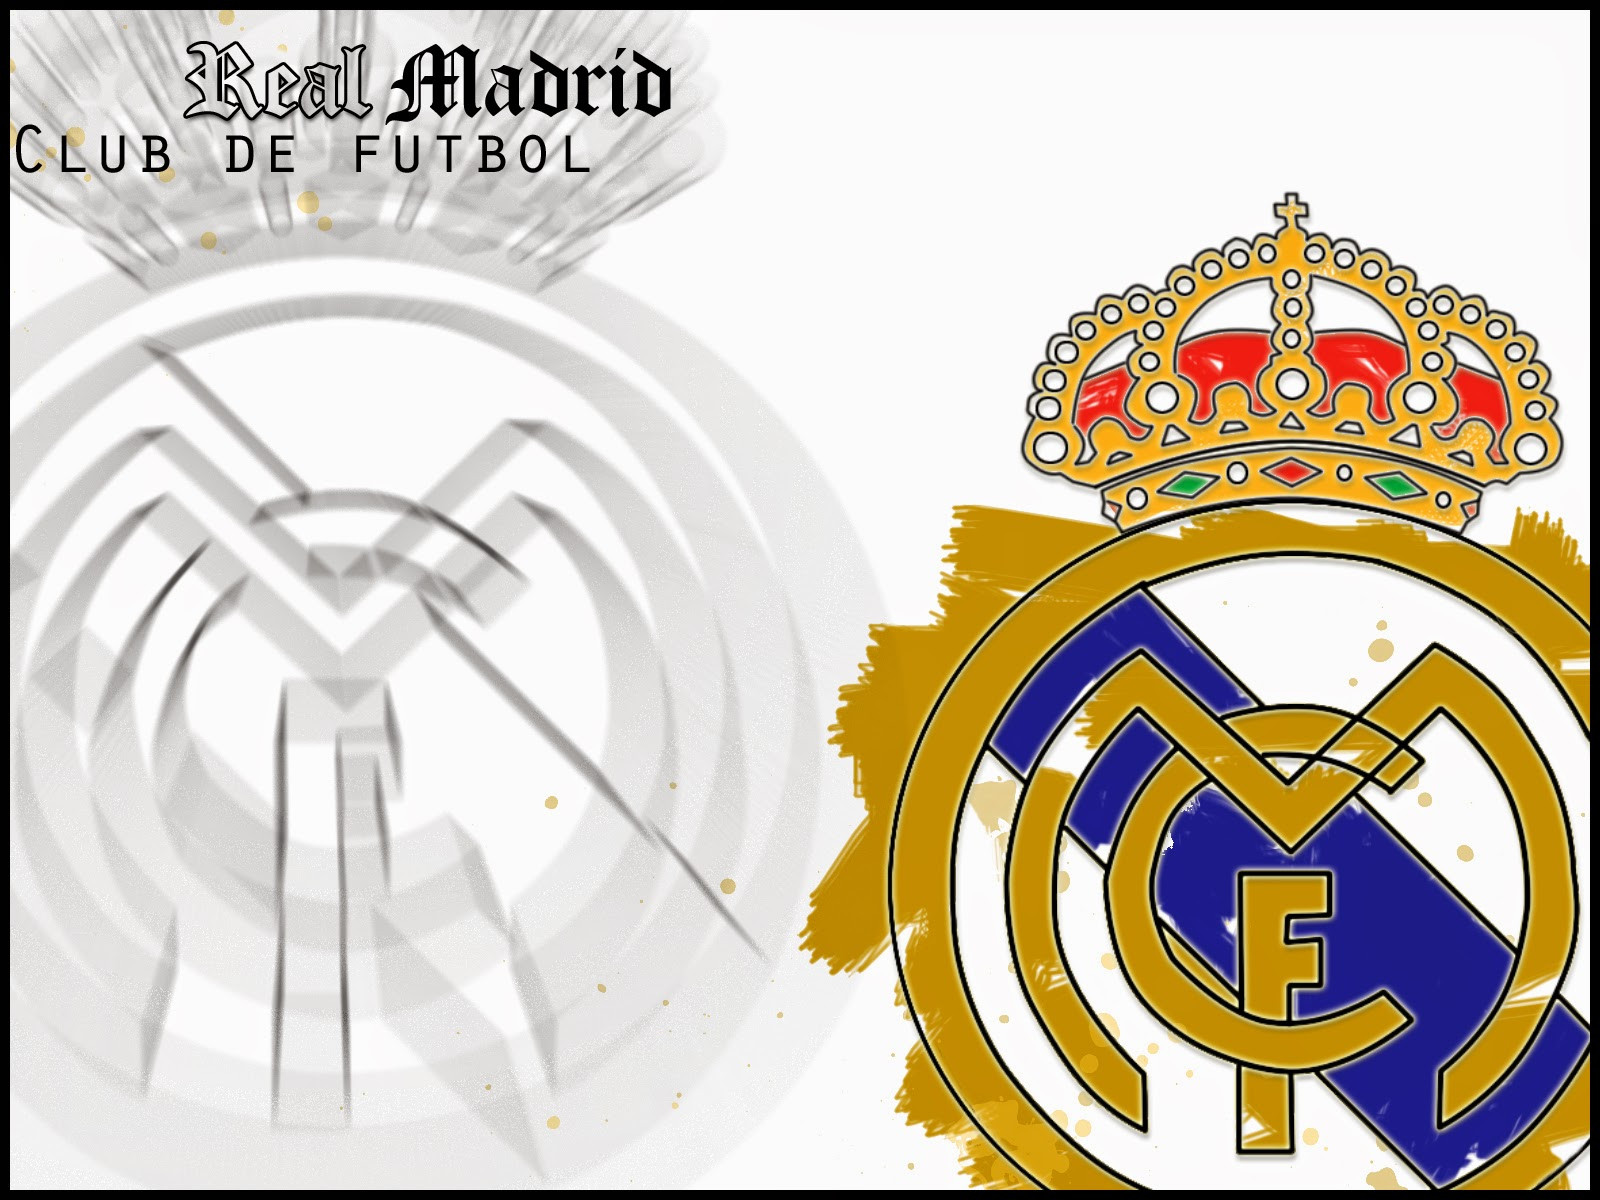 Real madrid football club wallpapers wallpapo wallpapo - Madrid wallpaper ...